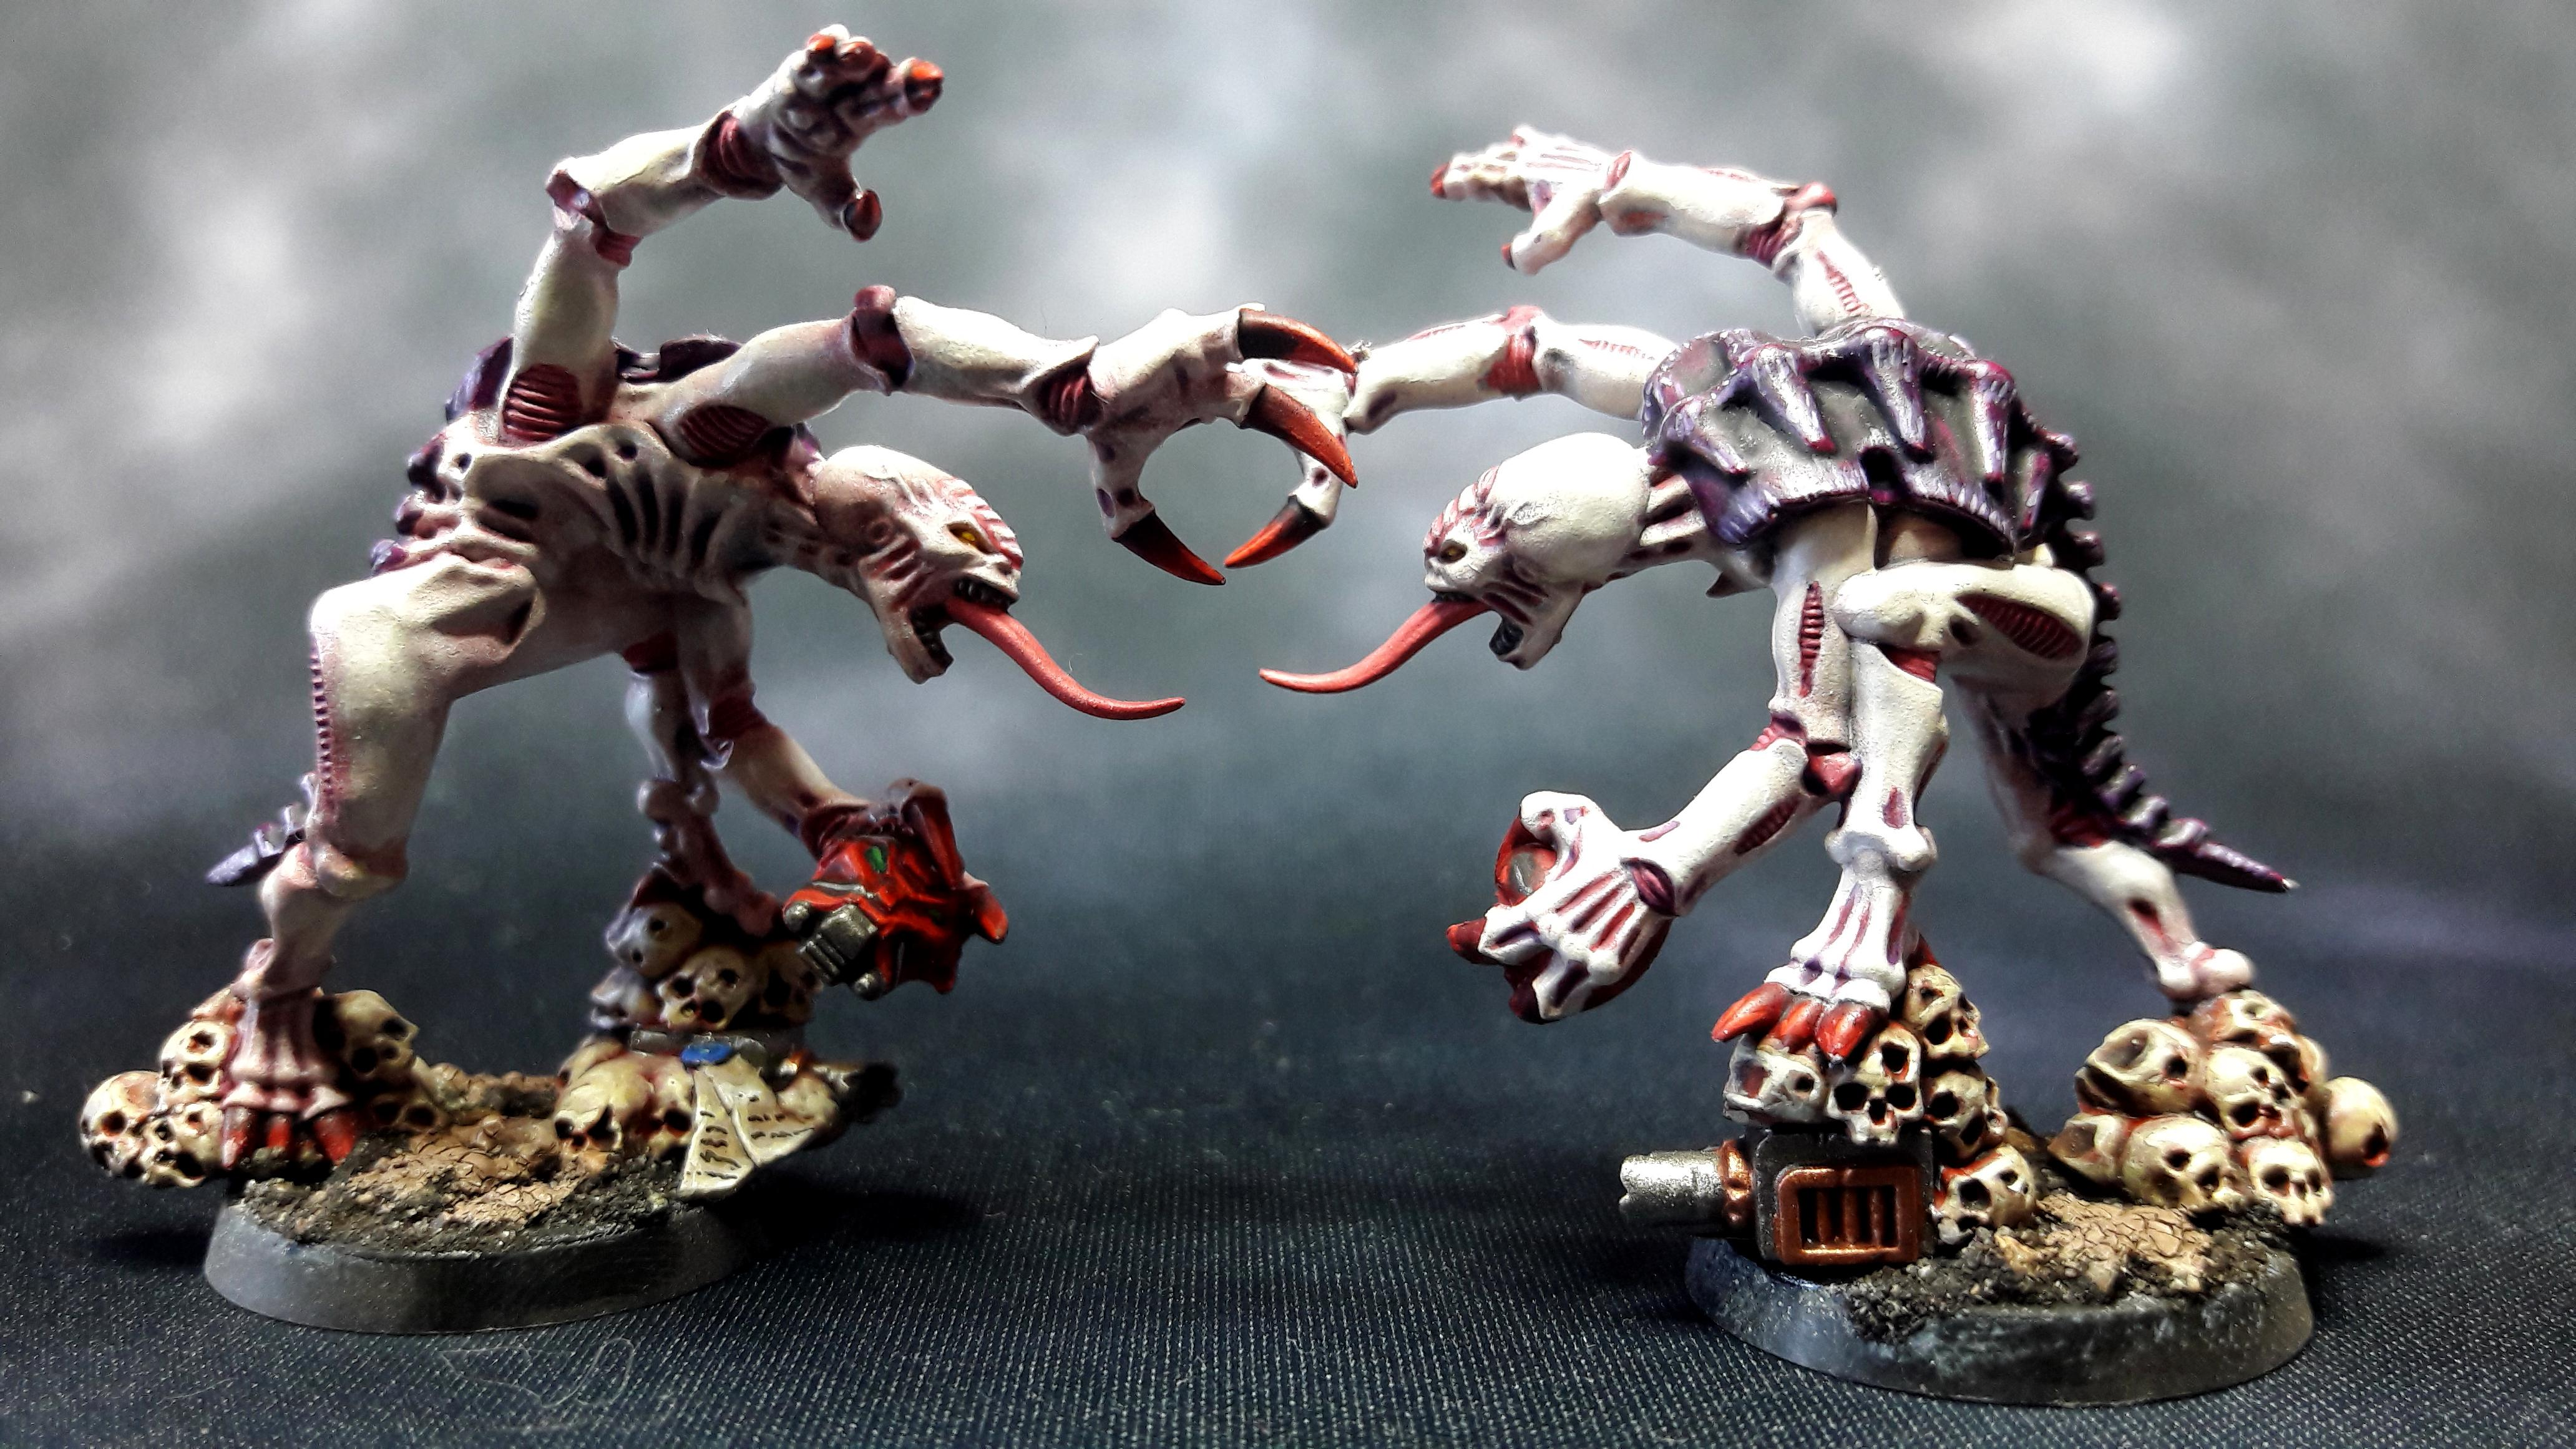 Genestealer, Hive Fleet Leviathan, Leviathan, Space Hulk